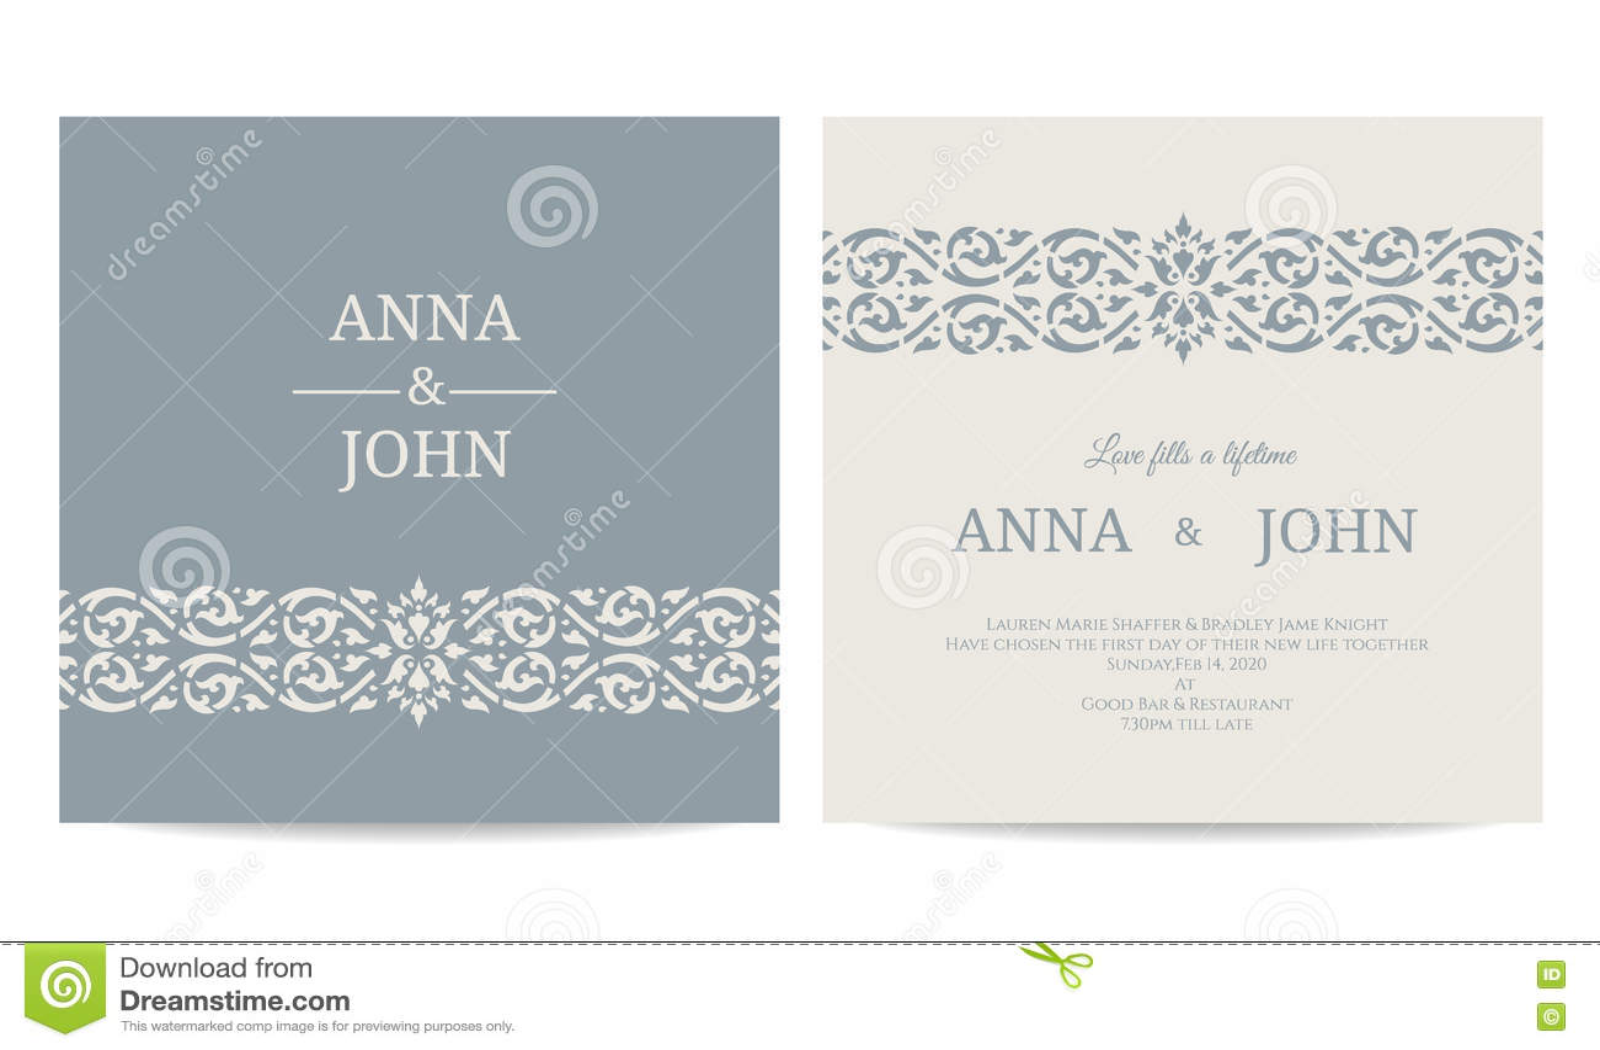 contemporary wedding invitations card line art gray blue tone